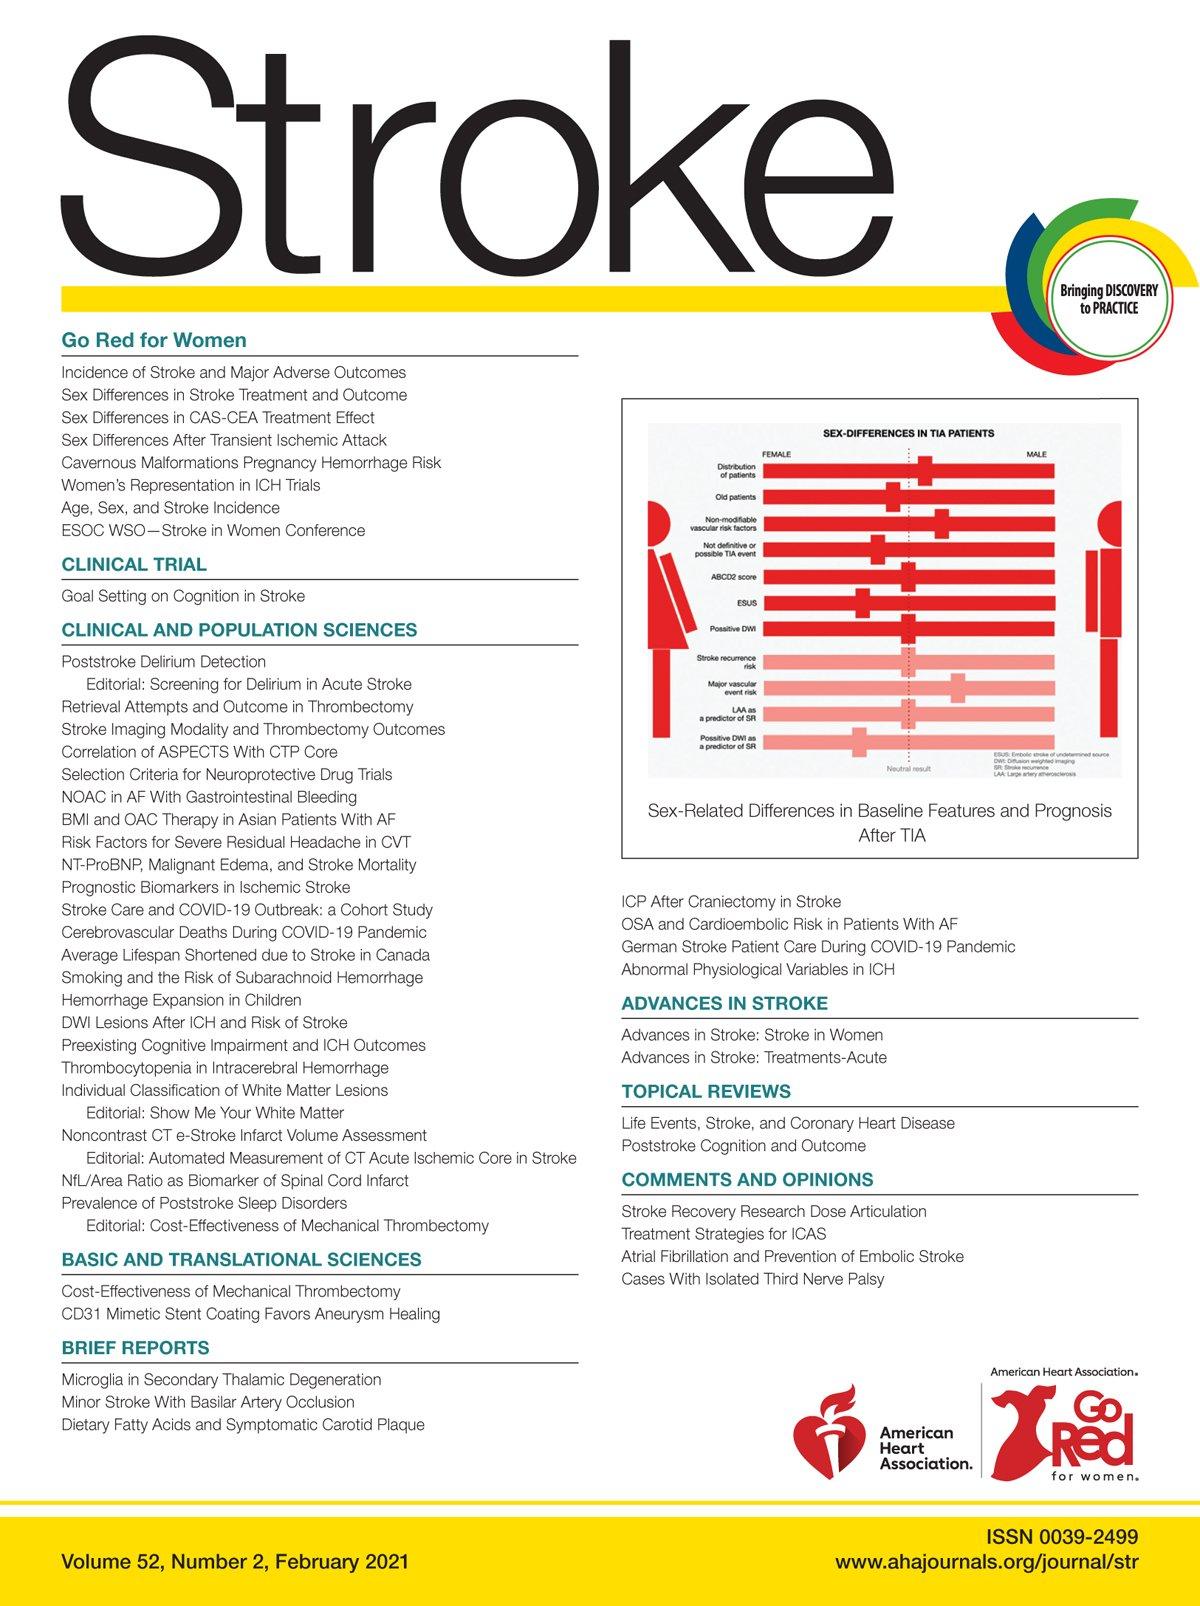 CD31 Mimetic Coating Enhances Flow Diverting Stent Integration